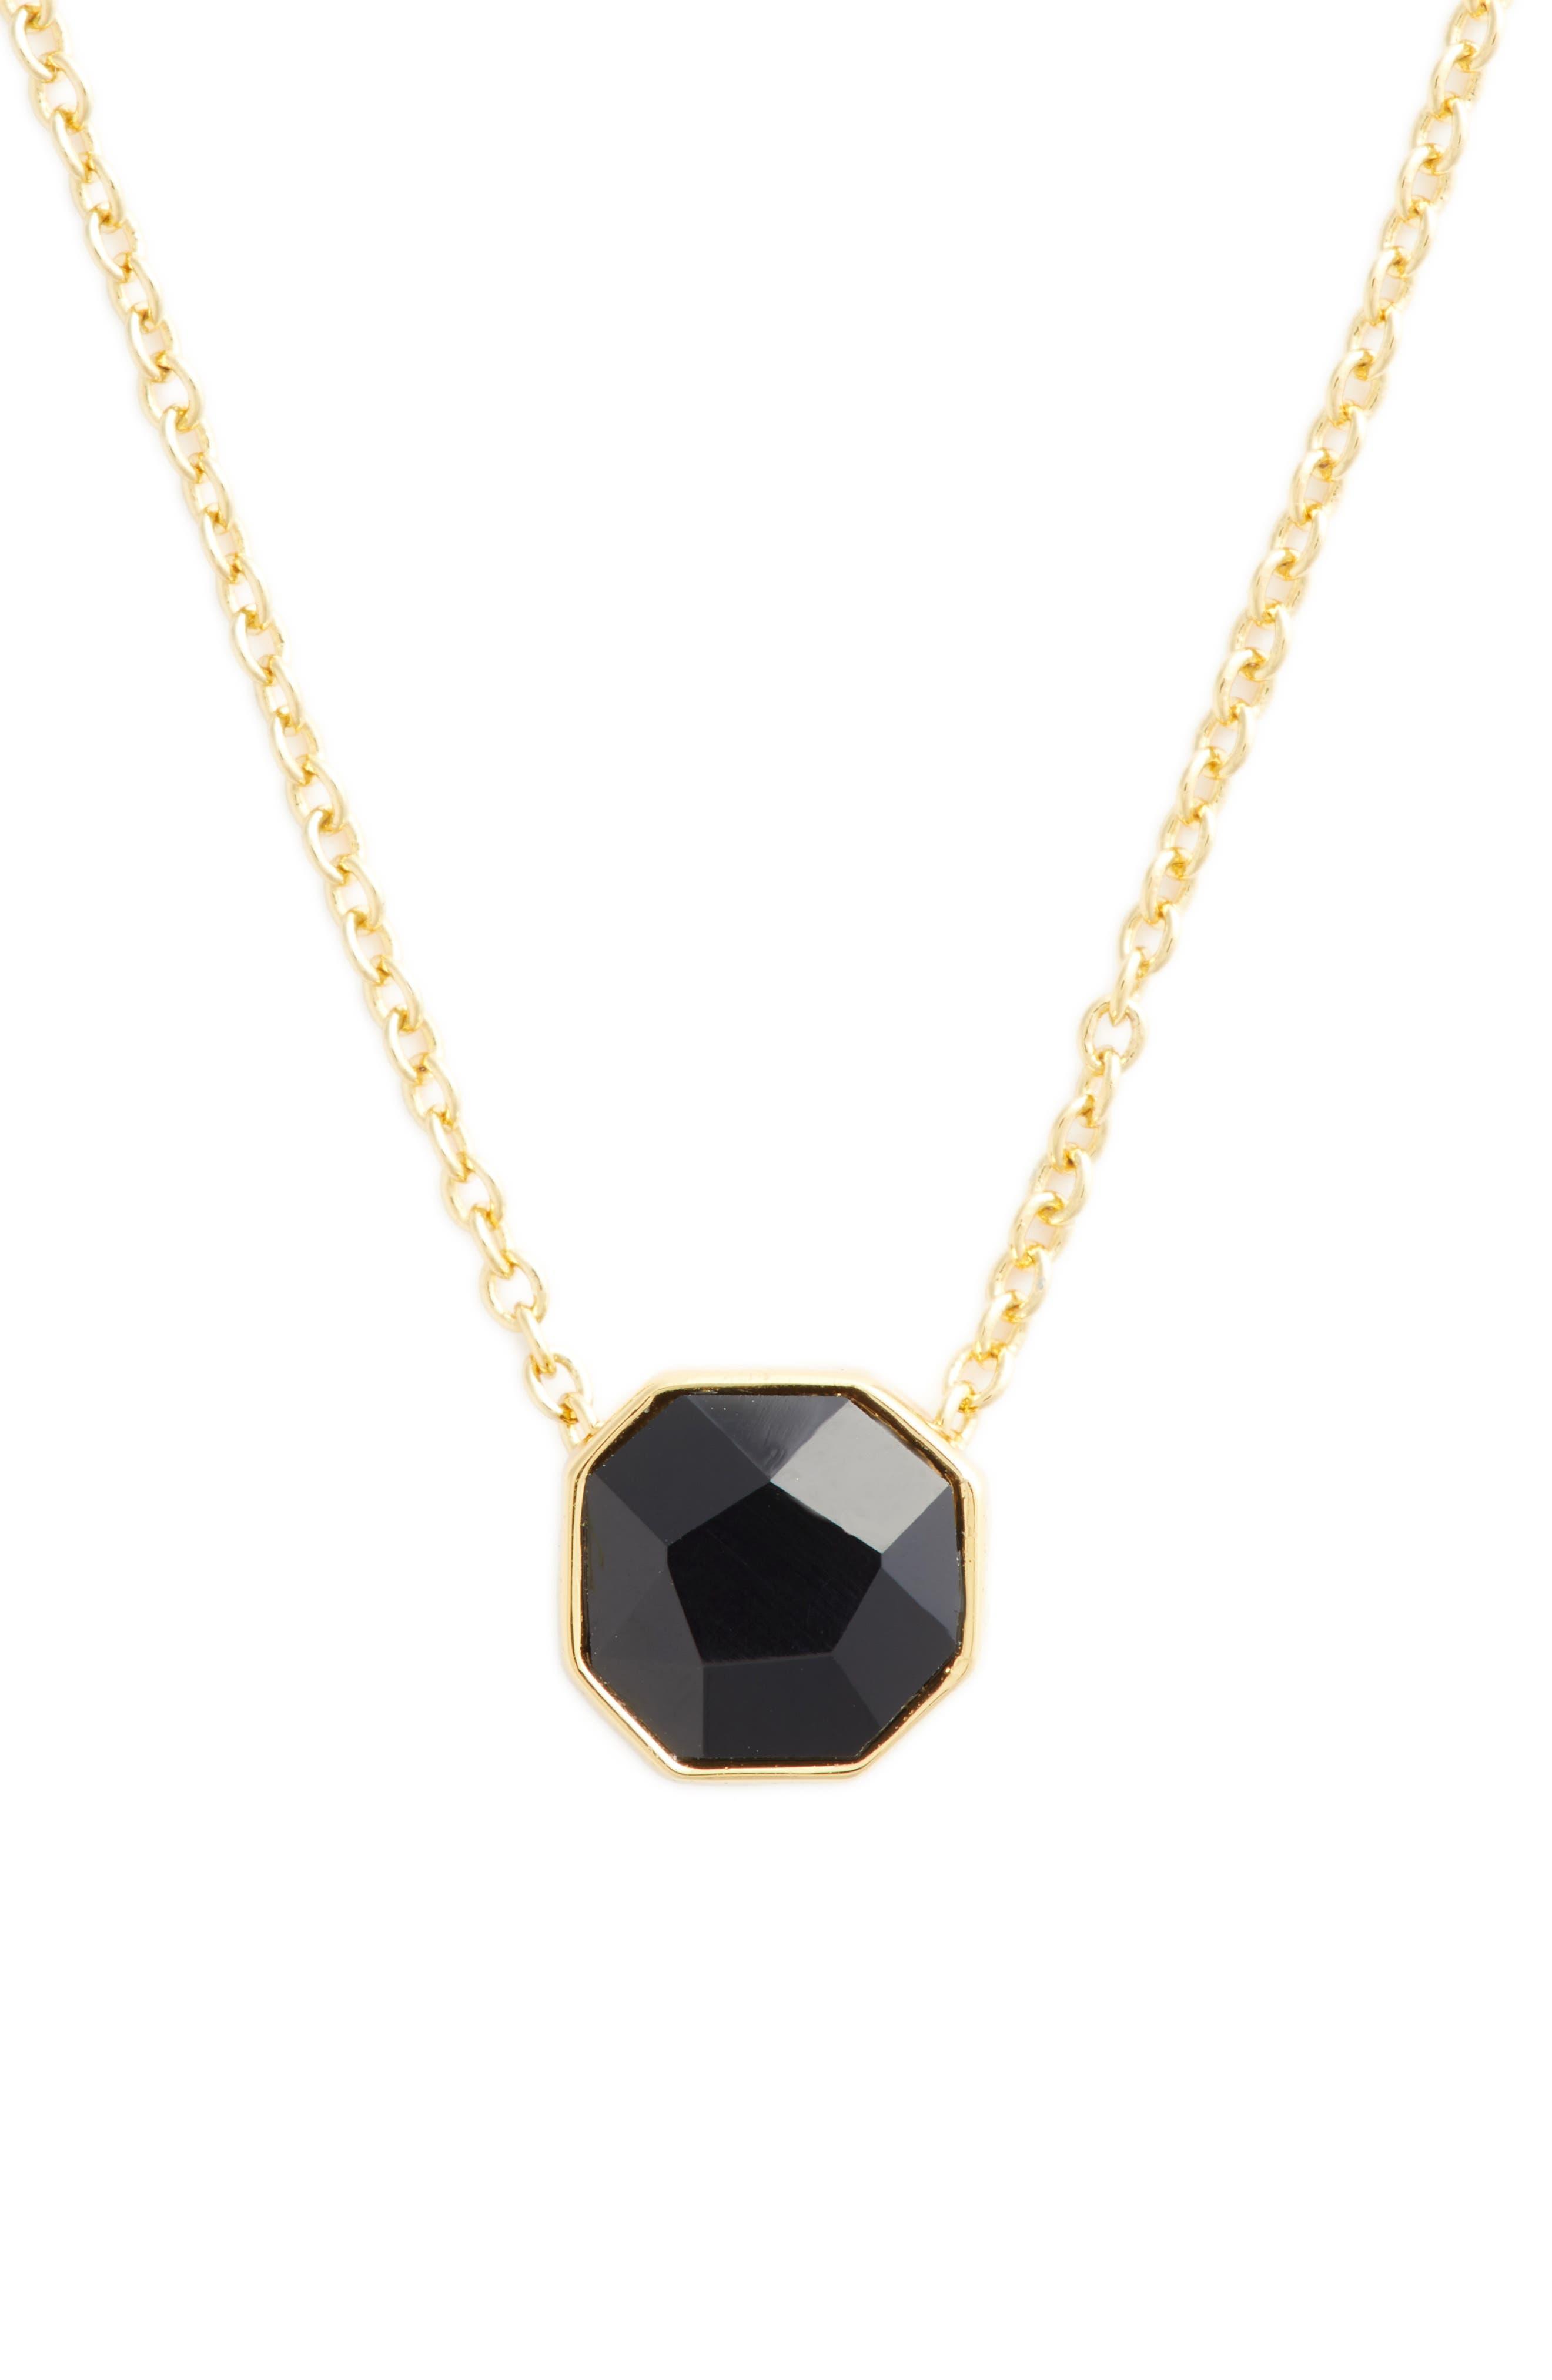 GORJANA Power Stone Adjustable Pendant Necklace, 18 in Black Onyx